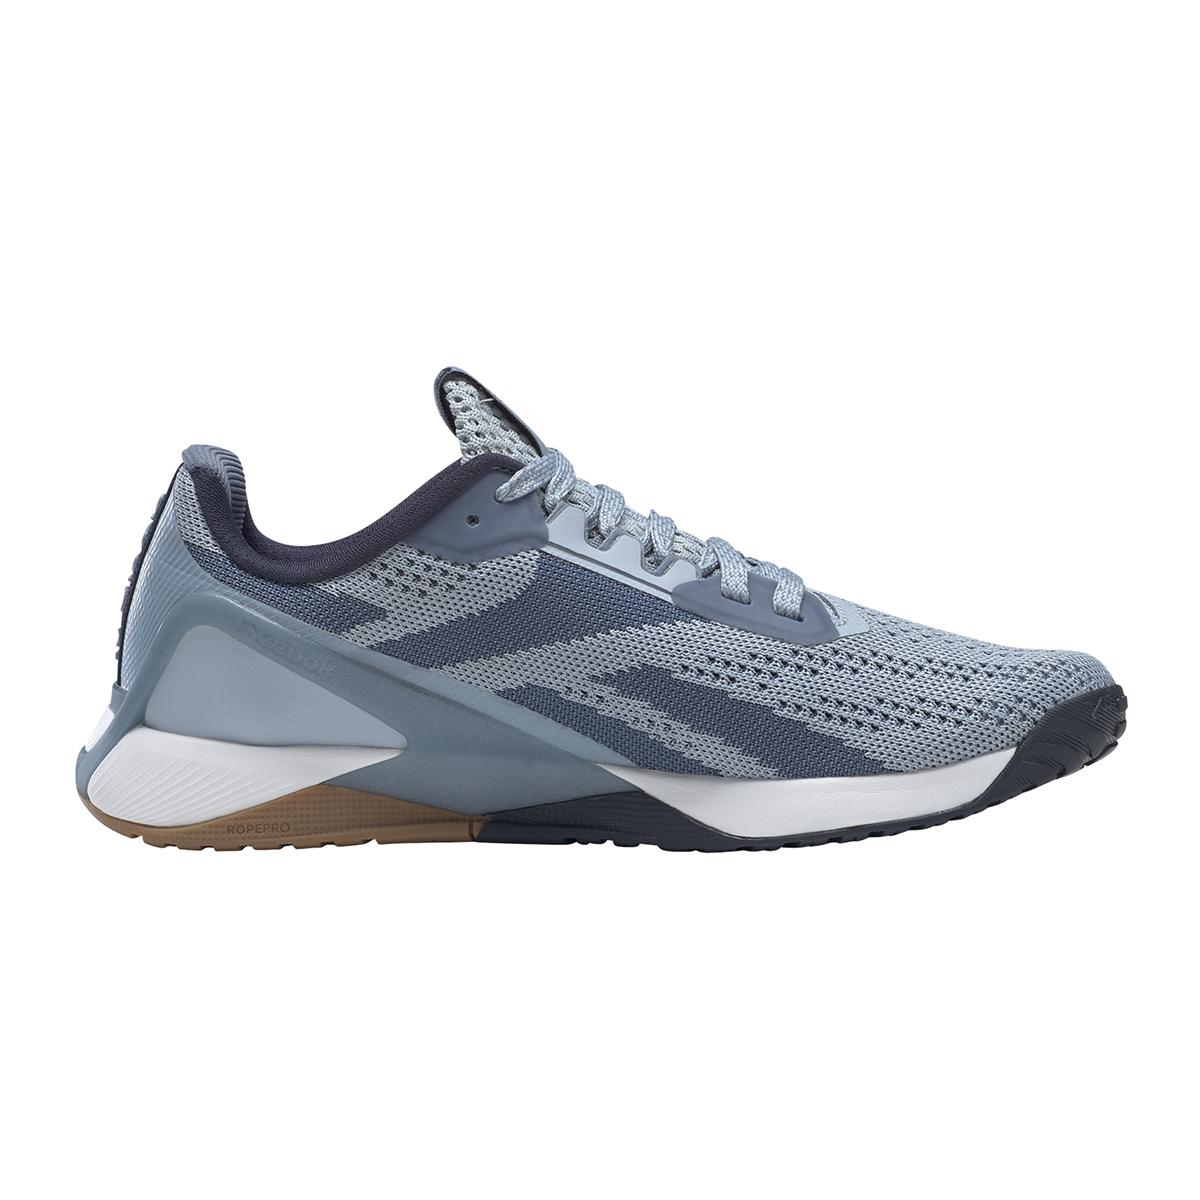 Women's Reebok Nano X1 Training Shoe - Color: Gable Grey/Blue Slate/Vector Navy - Size: 5 - Width: Regular, Gable Grey/Blue Slate/Vector Navy, large, image 1